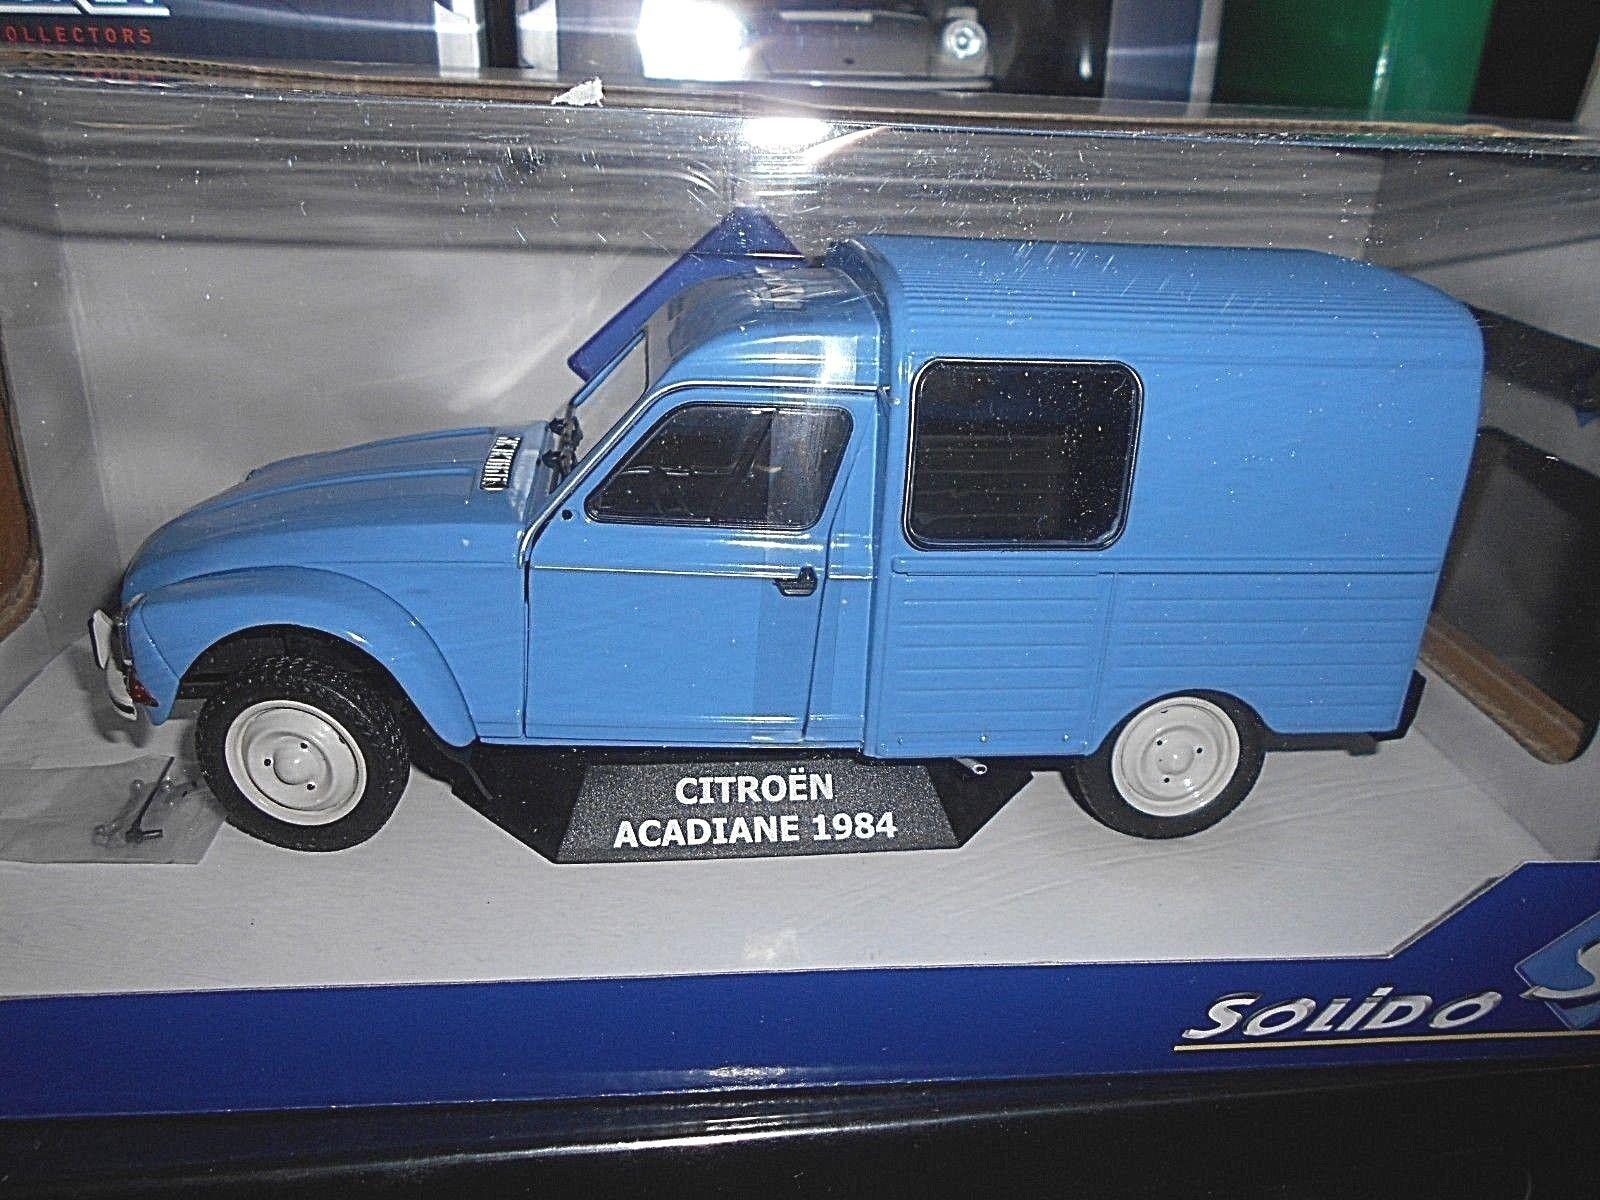 CITROEN DIANE ACADIANE encadré Bleu bleu 1984 SOLIDO métal RAR 1 18